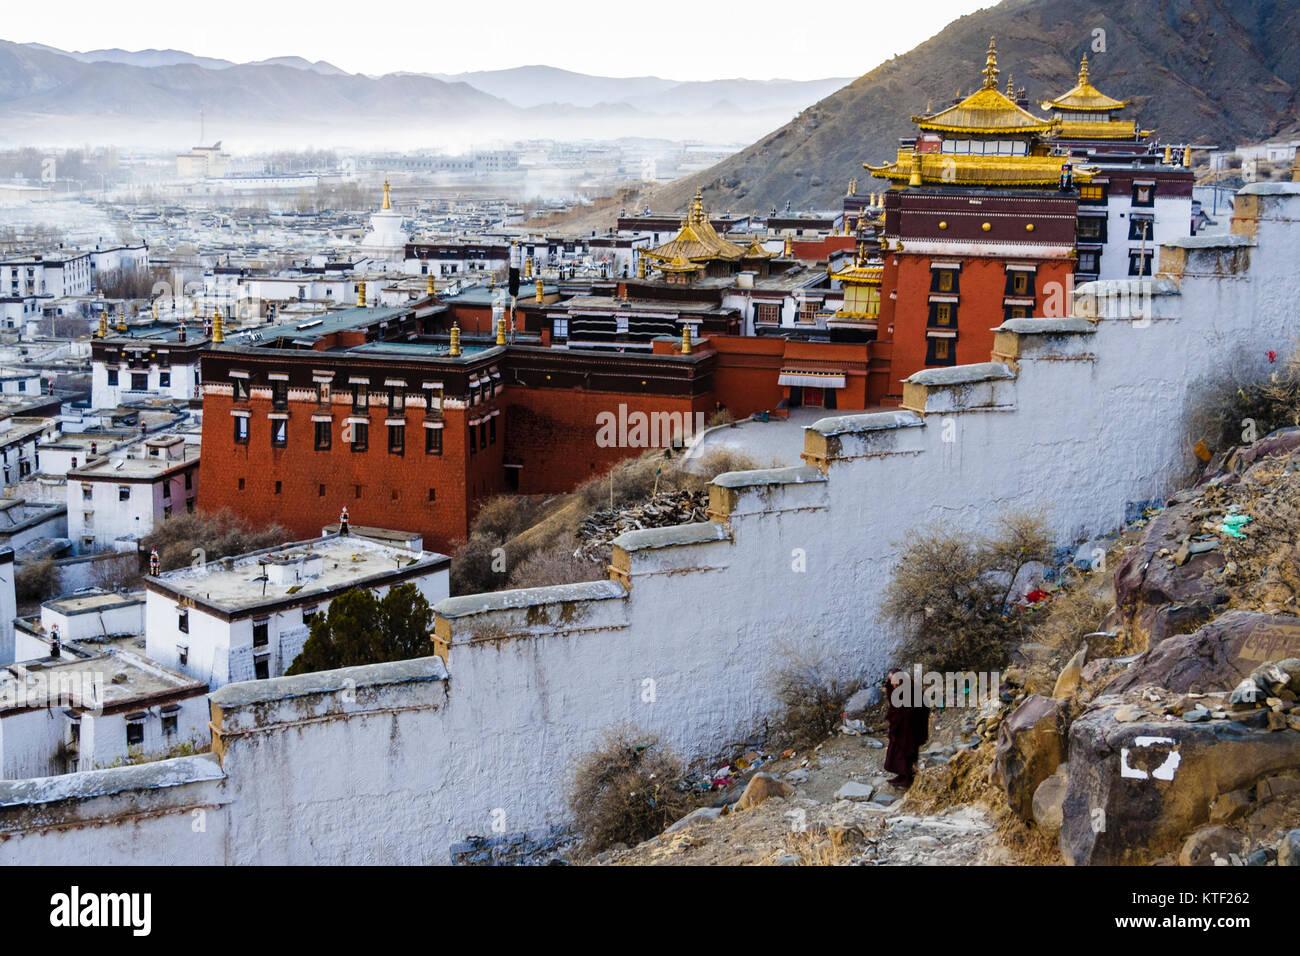 Tashilhunpo Monastery, Shigatse, Tibet - Stock Image